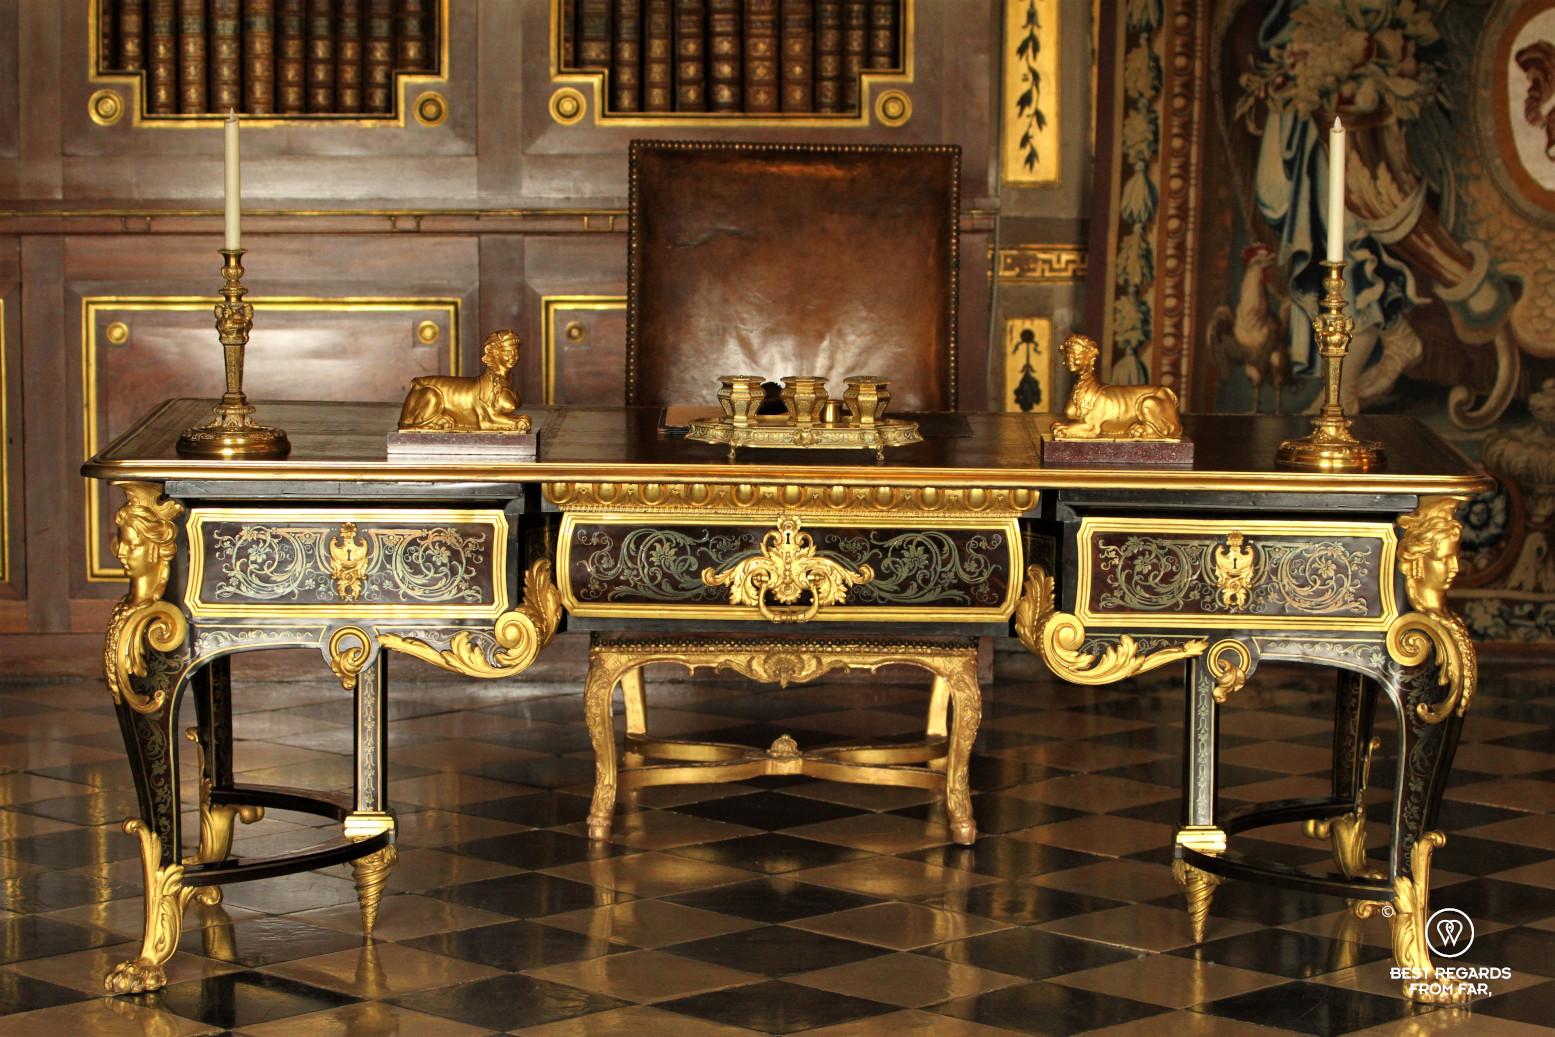 Desk in the castle of Vaux le Vicomte, France